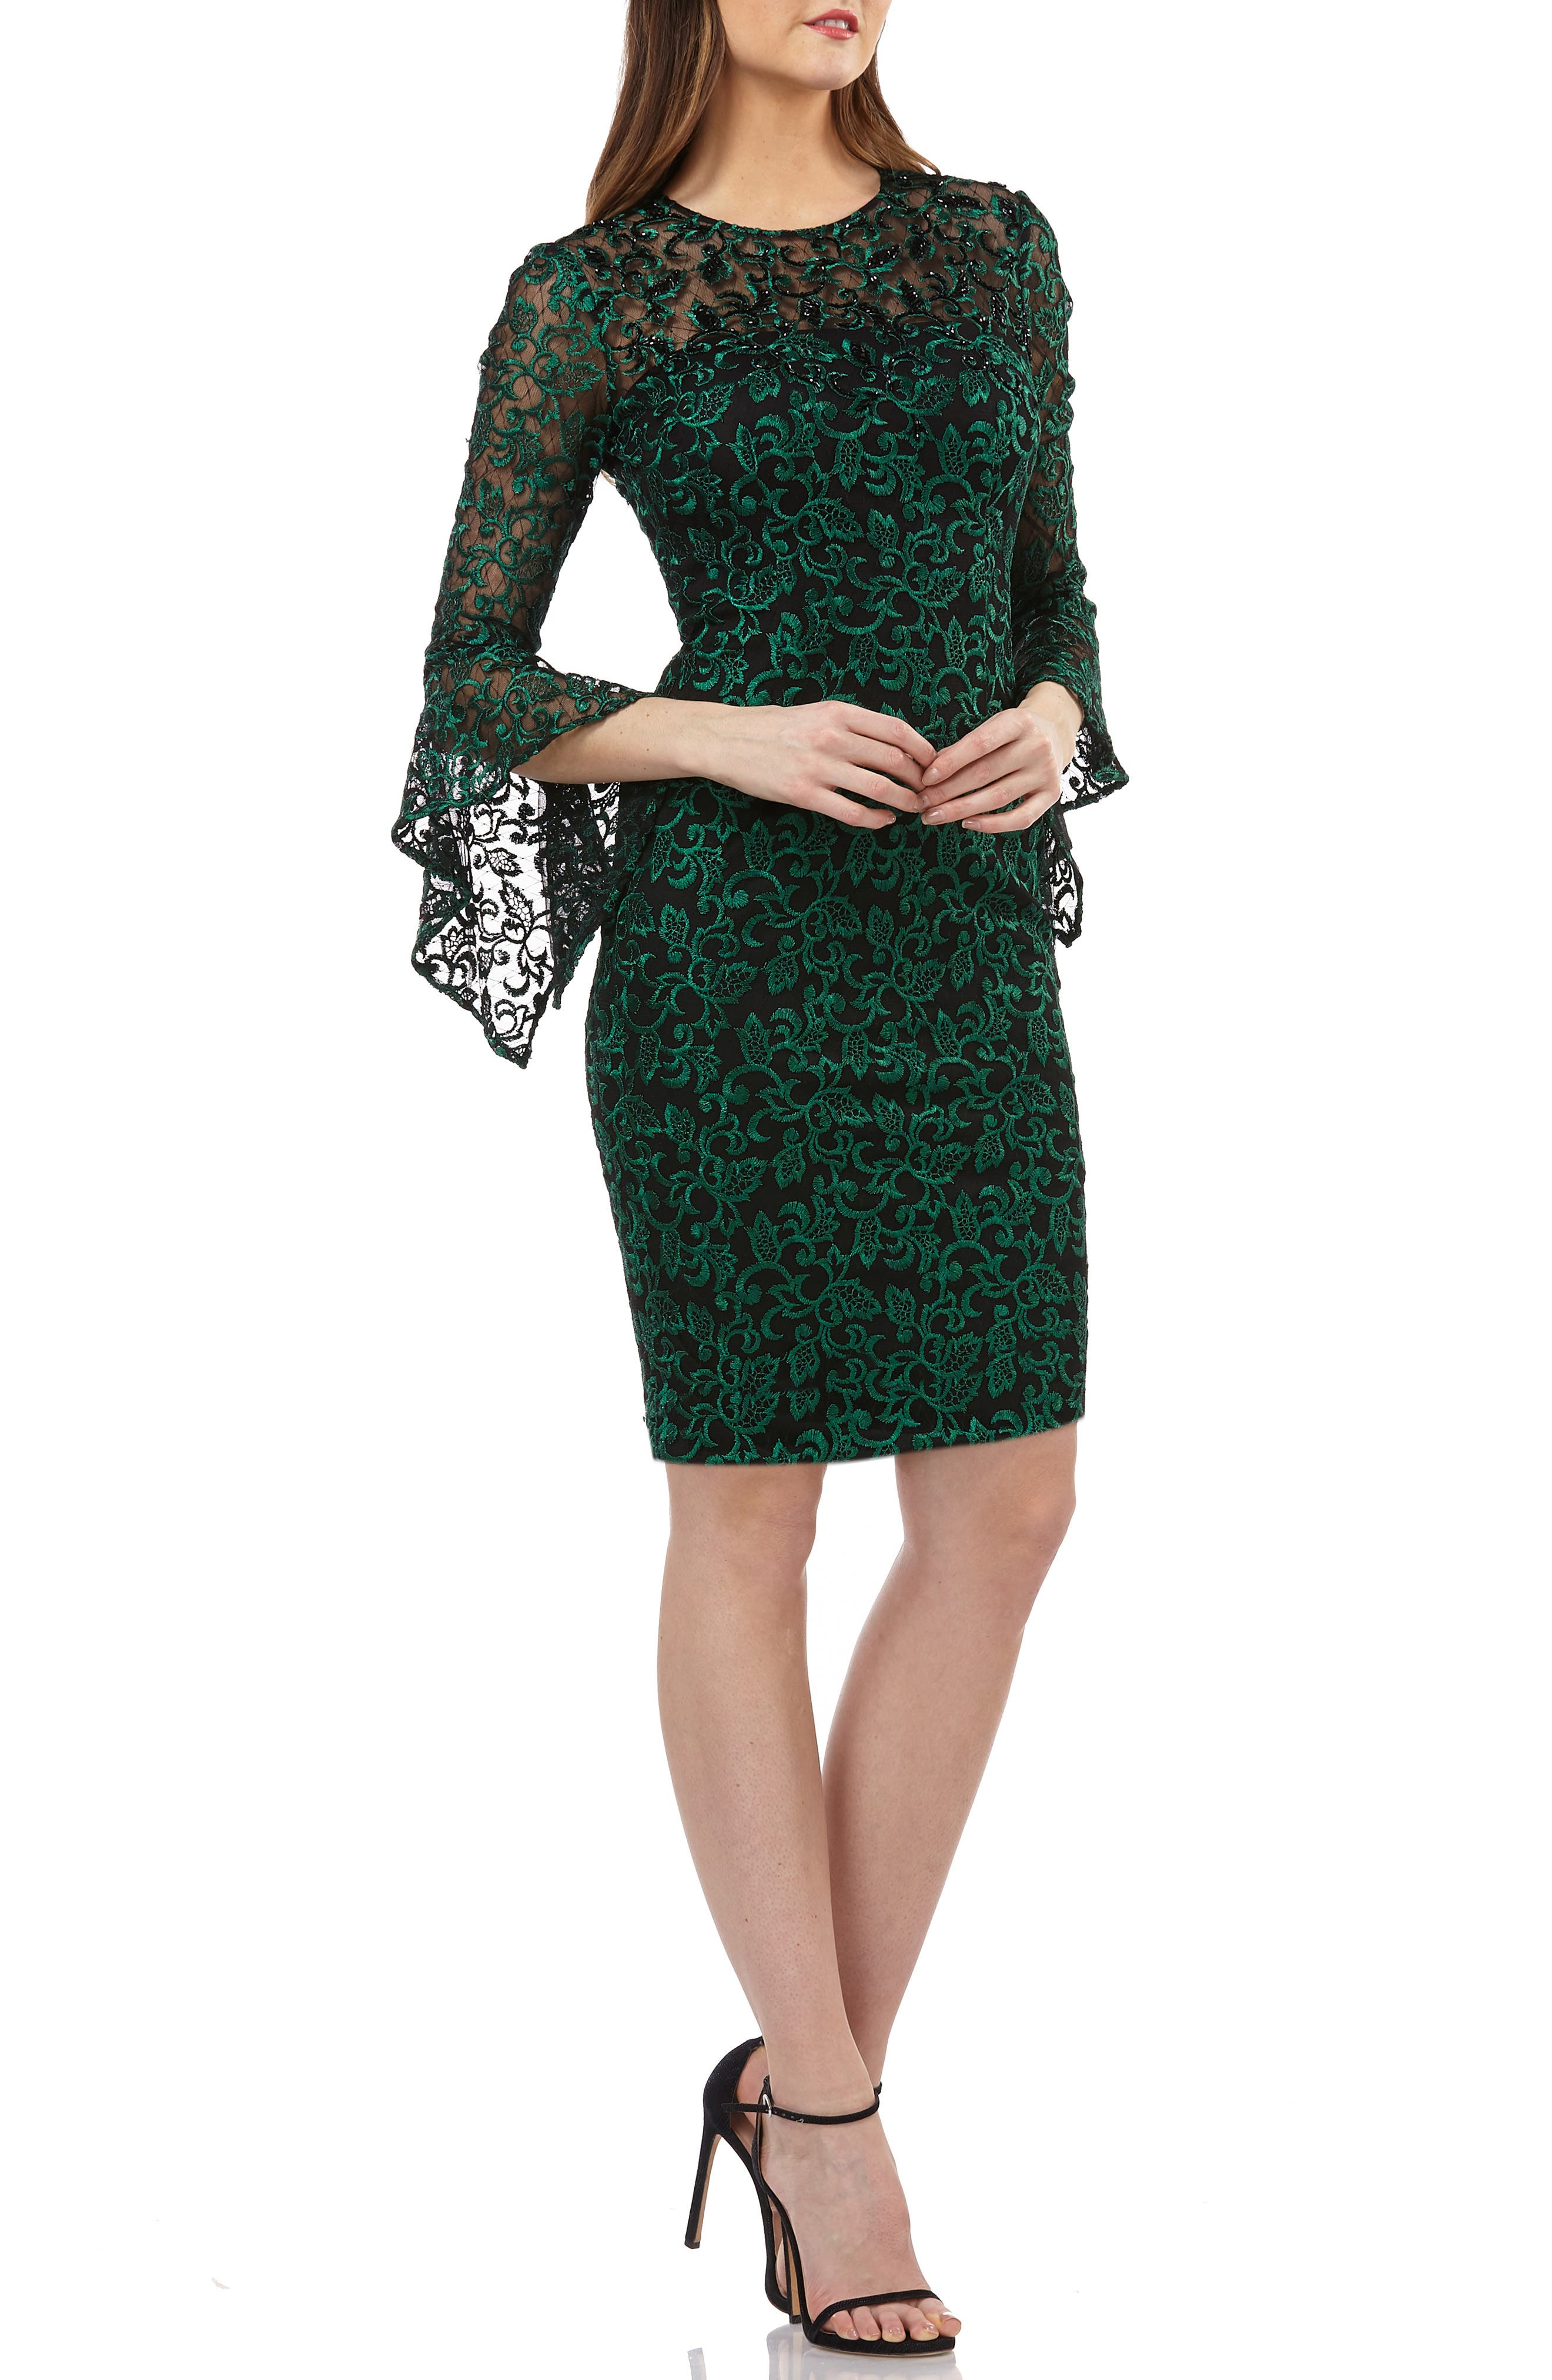 CARMEN MARC VALVO INFUSION Beaded Threadwork Cocktail Dress in Green/ Black